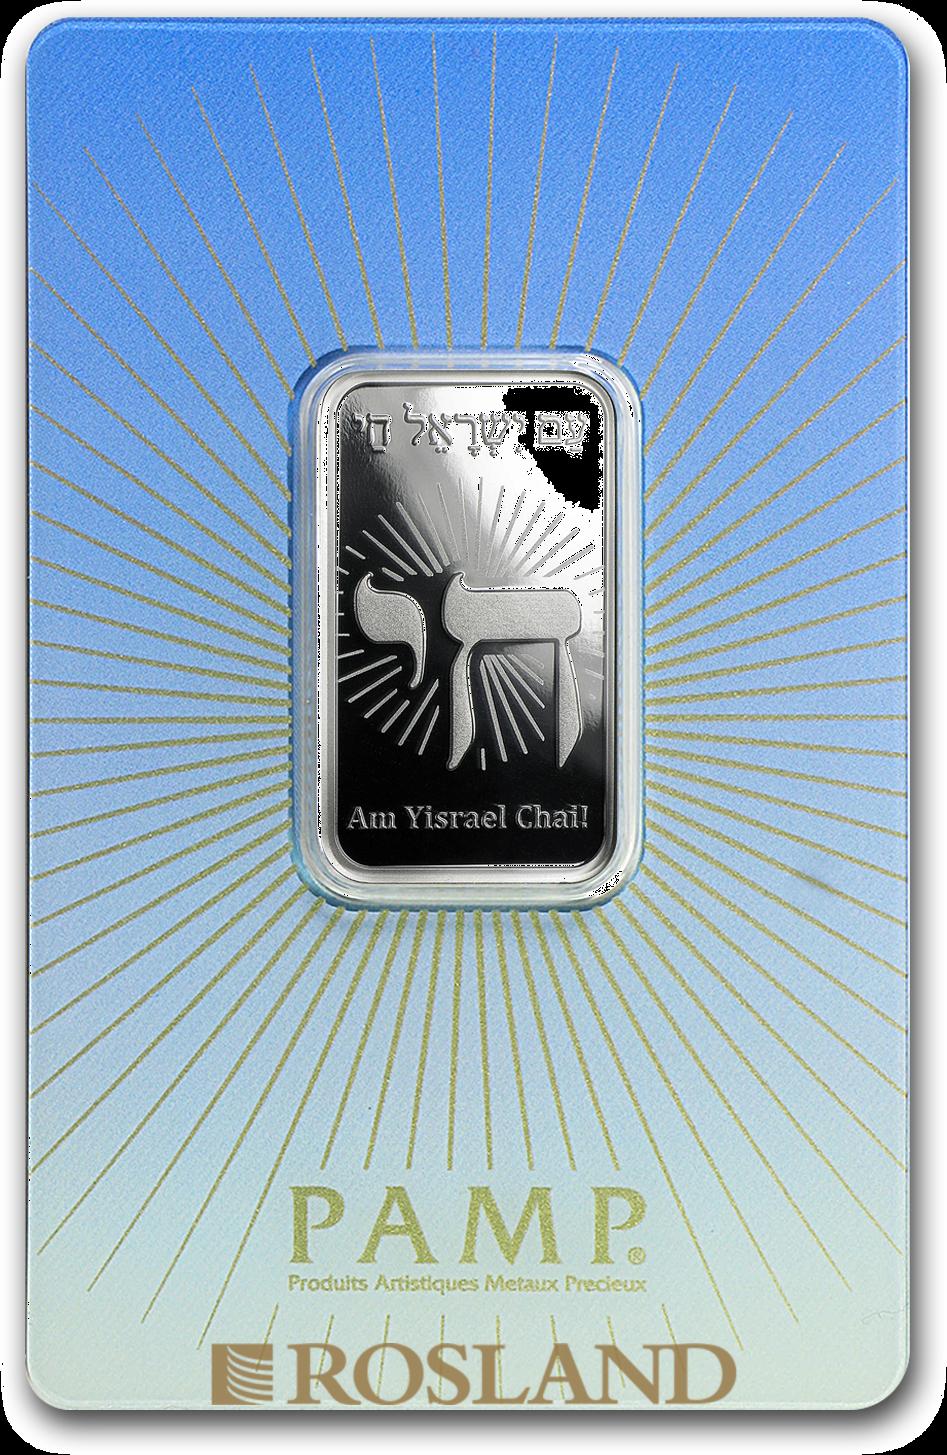 10 Gramm Silberbarren PAMP Religion - Am Yisrael Chai